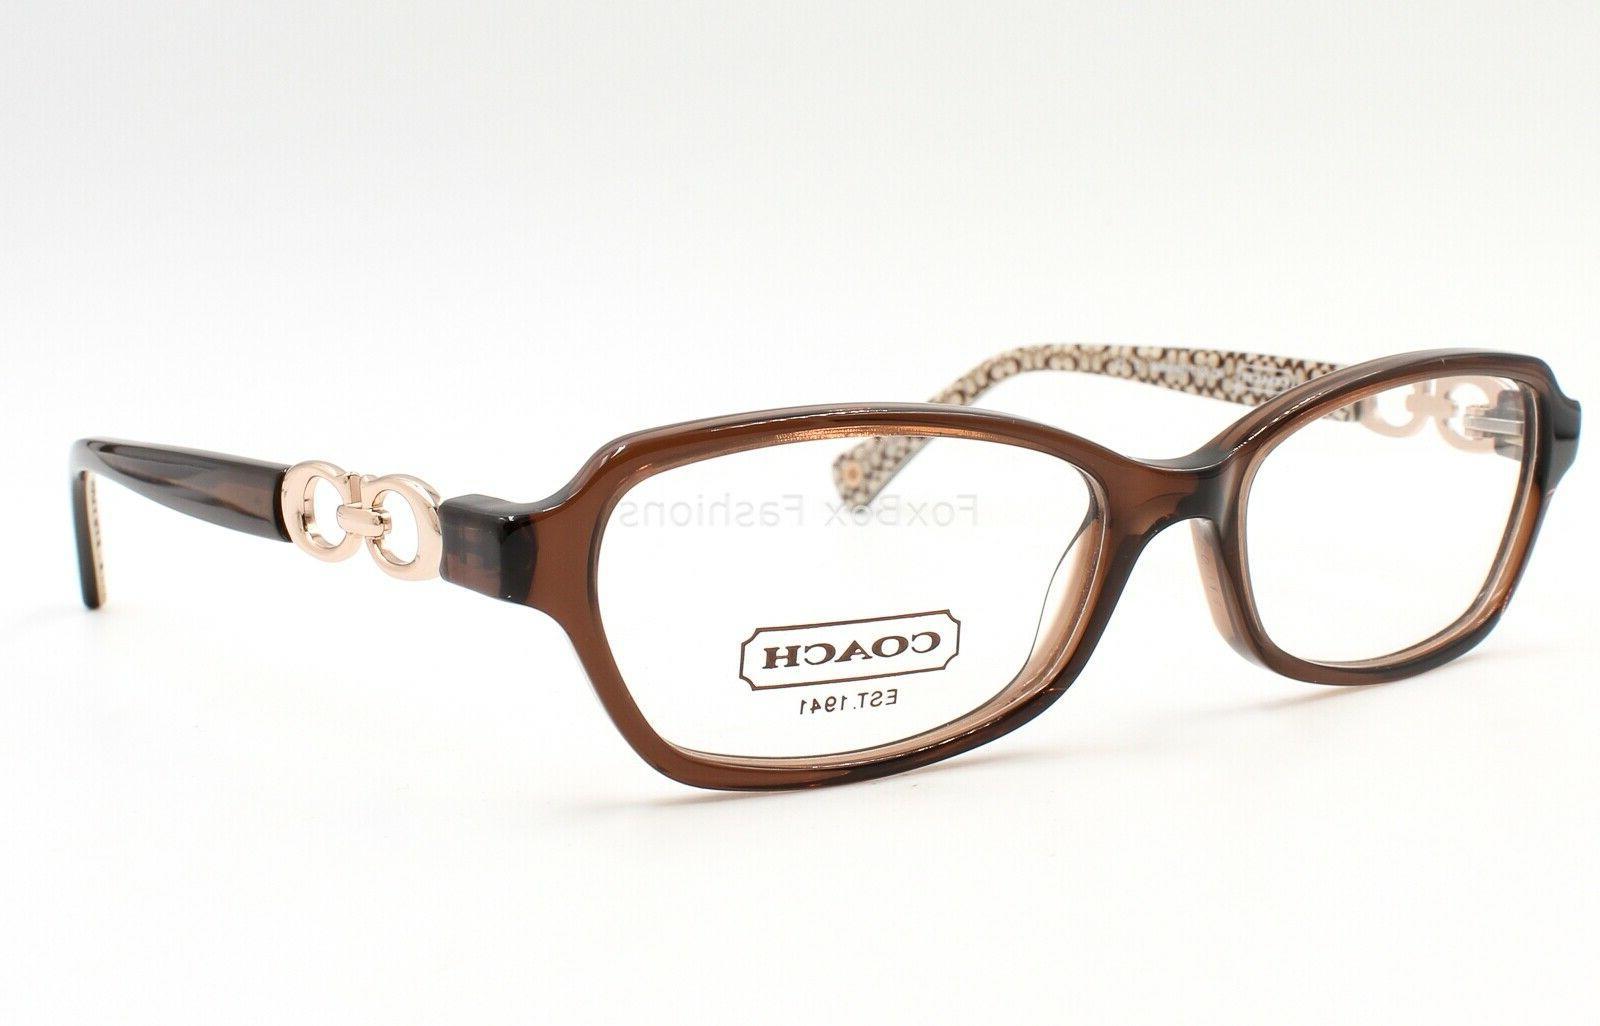 COACH HC 6017 Vanessa Eyeglasses Glasses Brown & 52-15-135